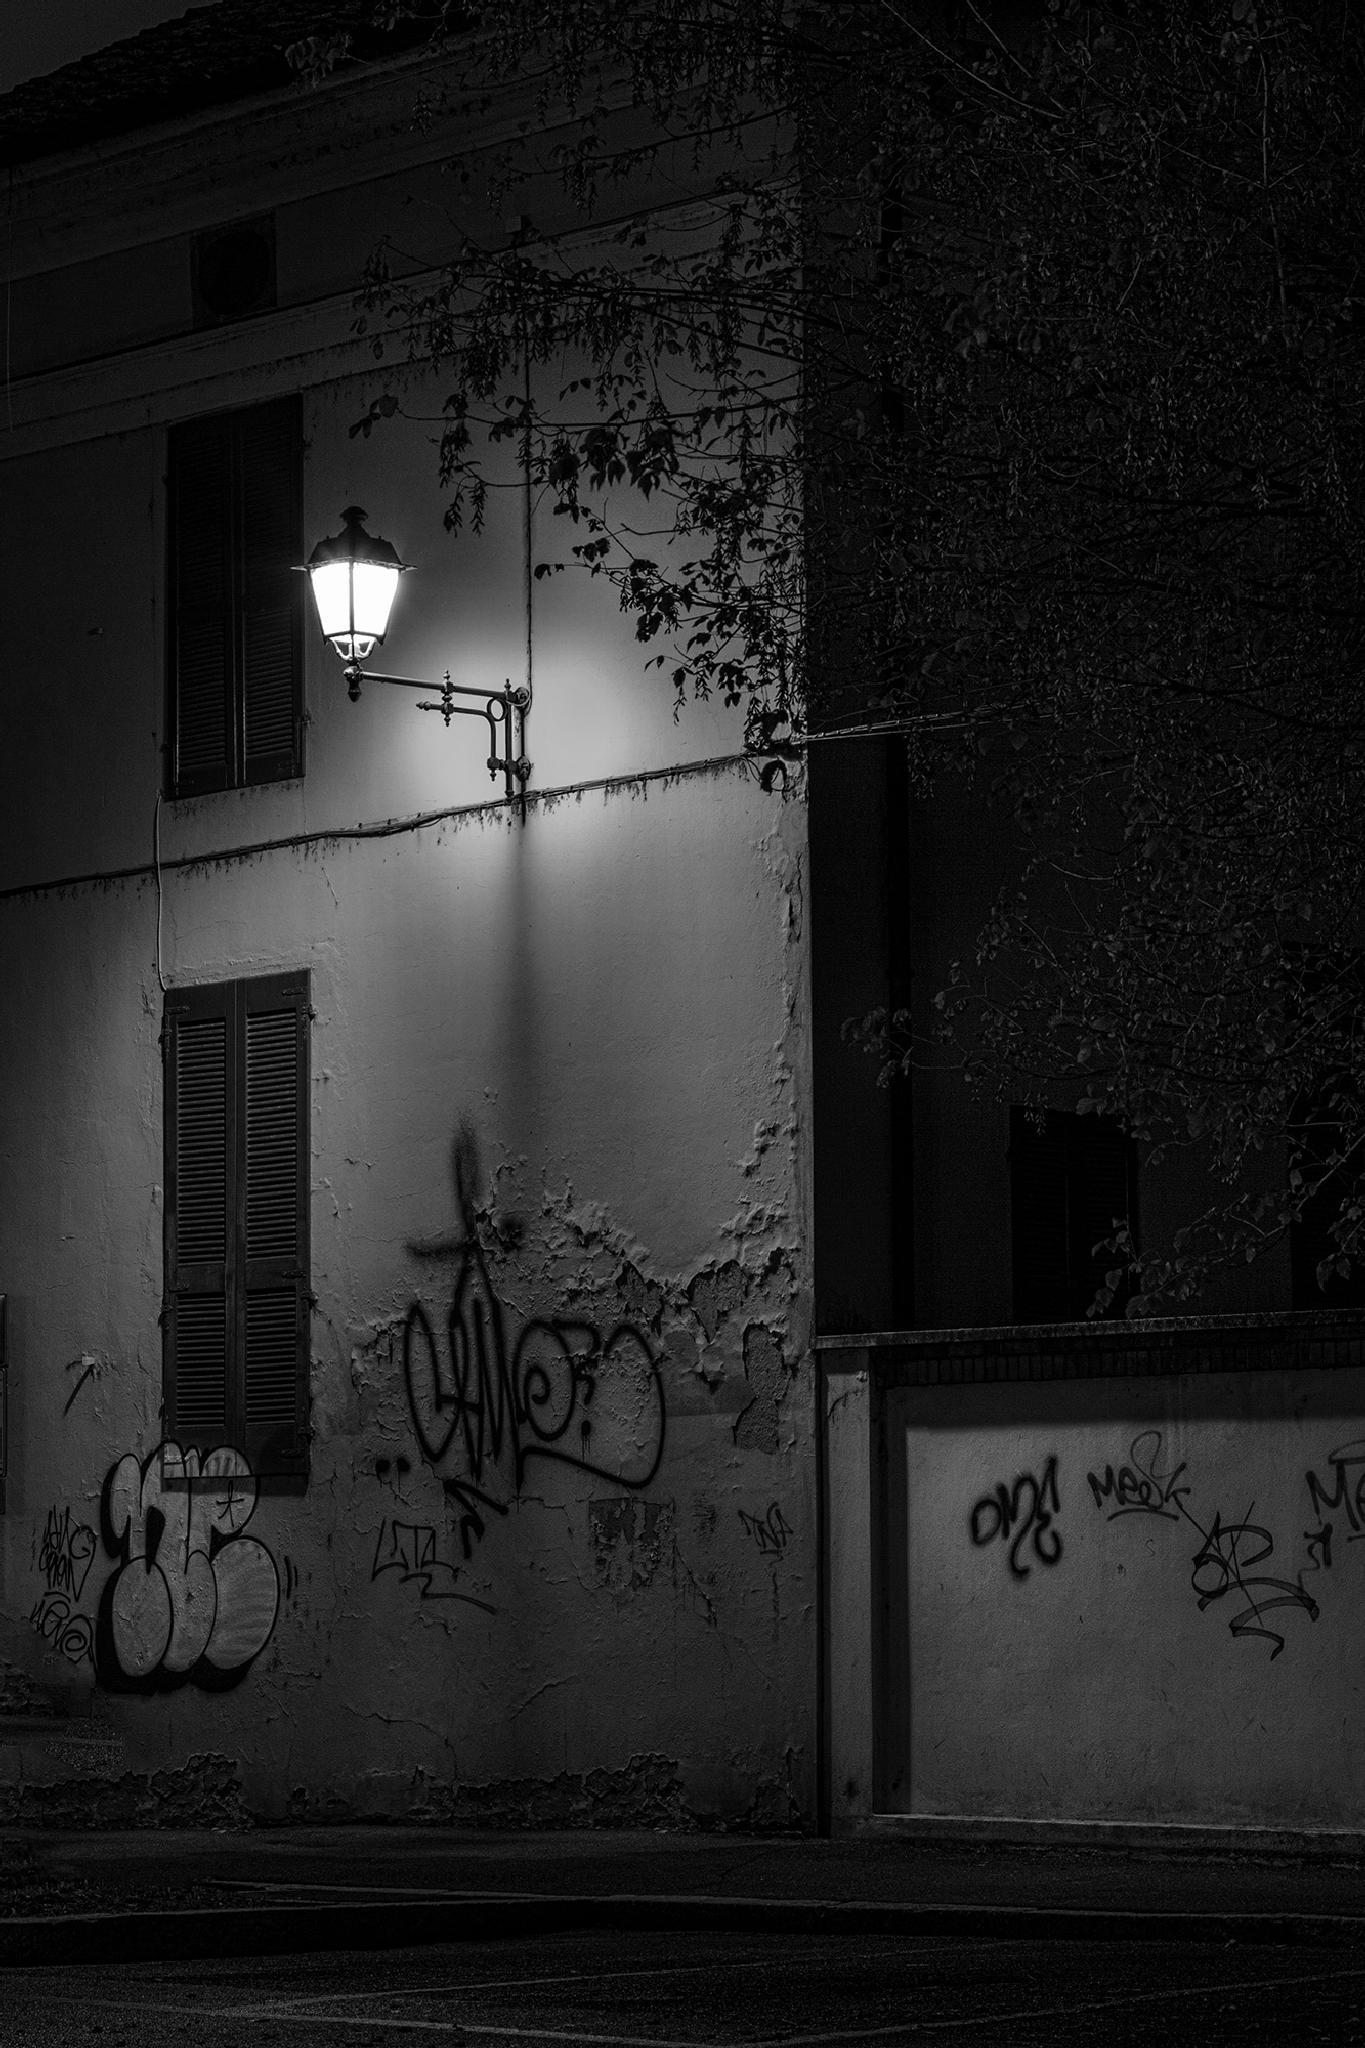 Street Lamp over murals by gabrielefabrizios